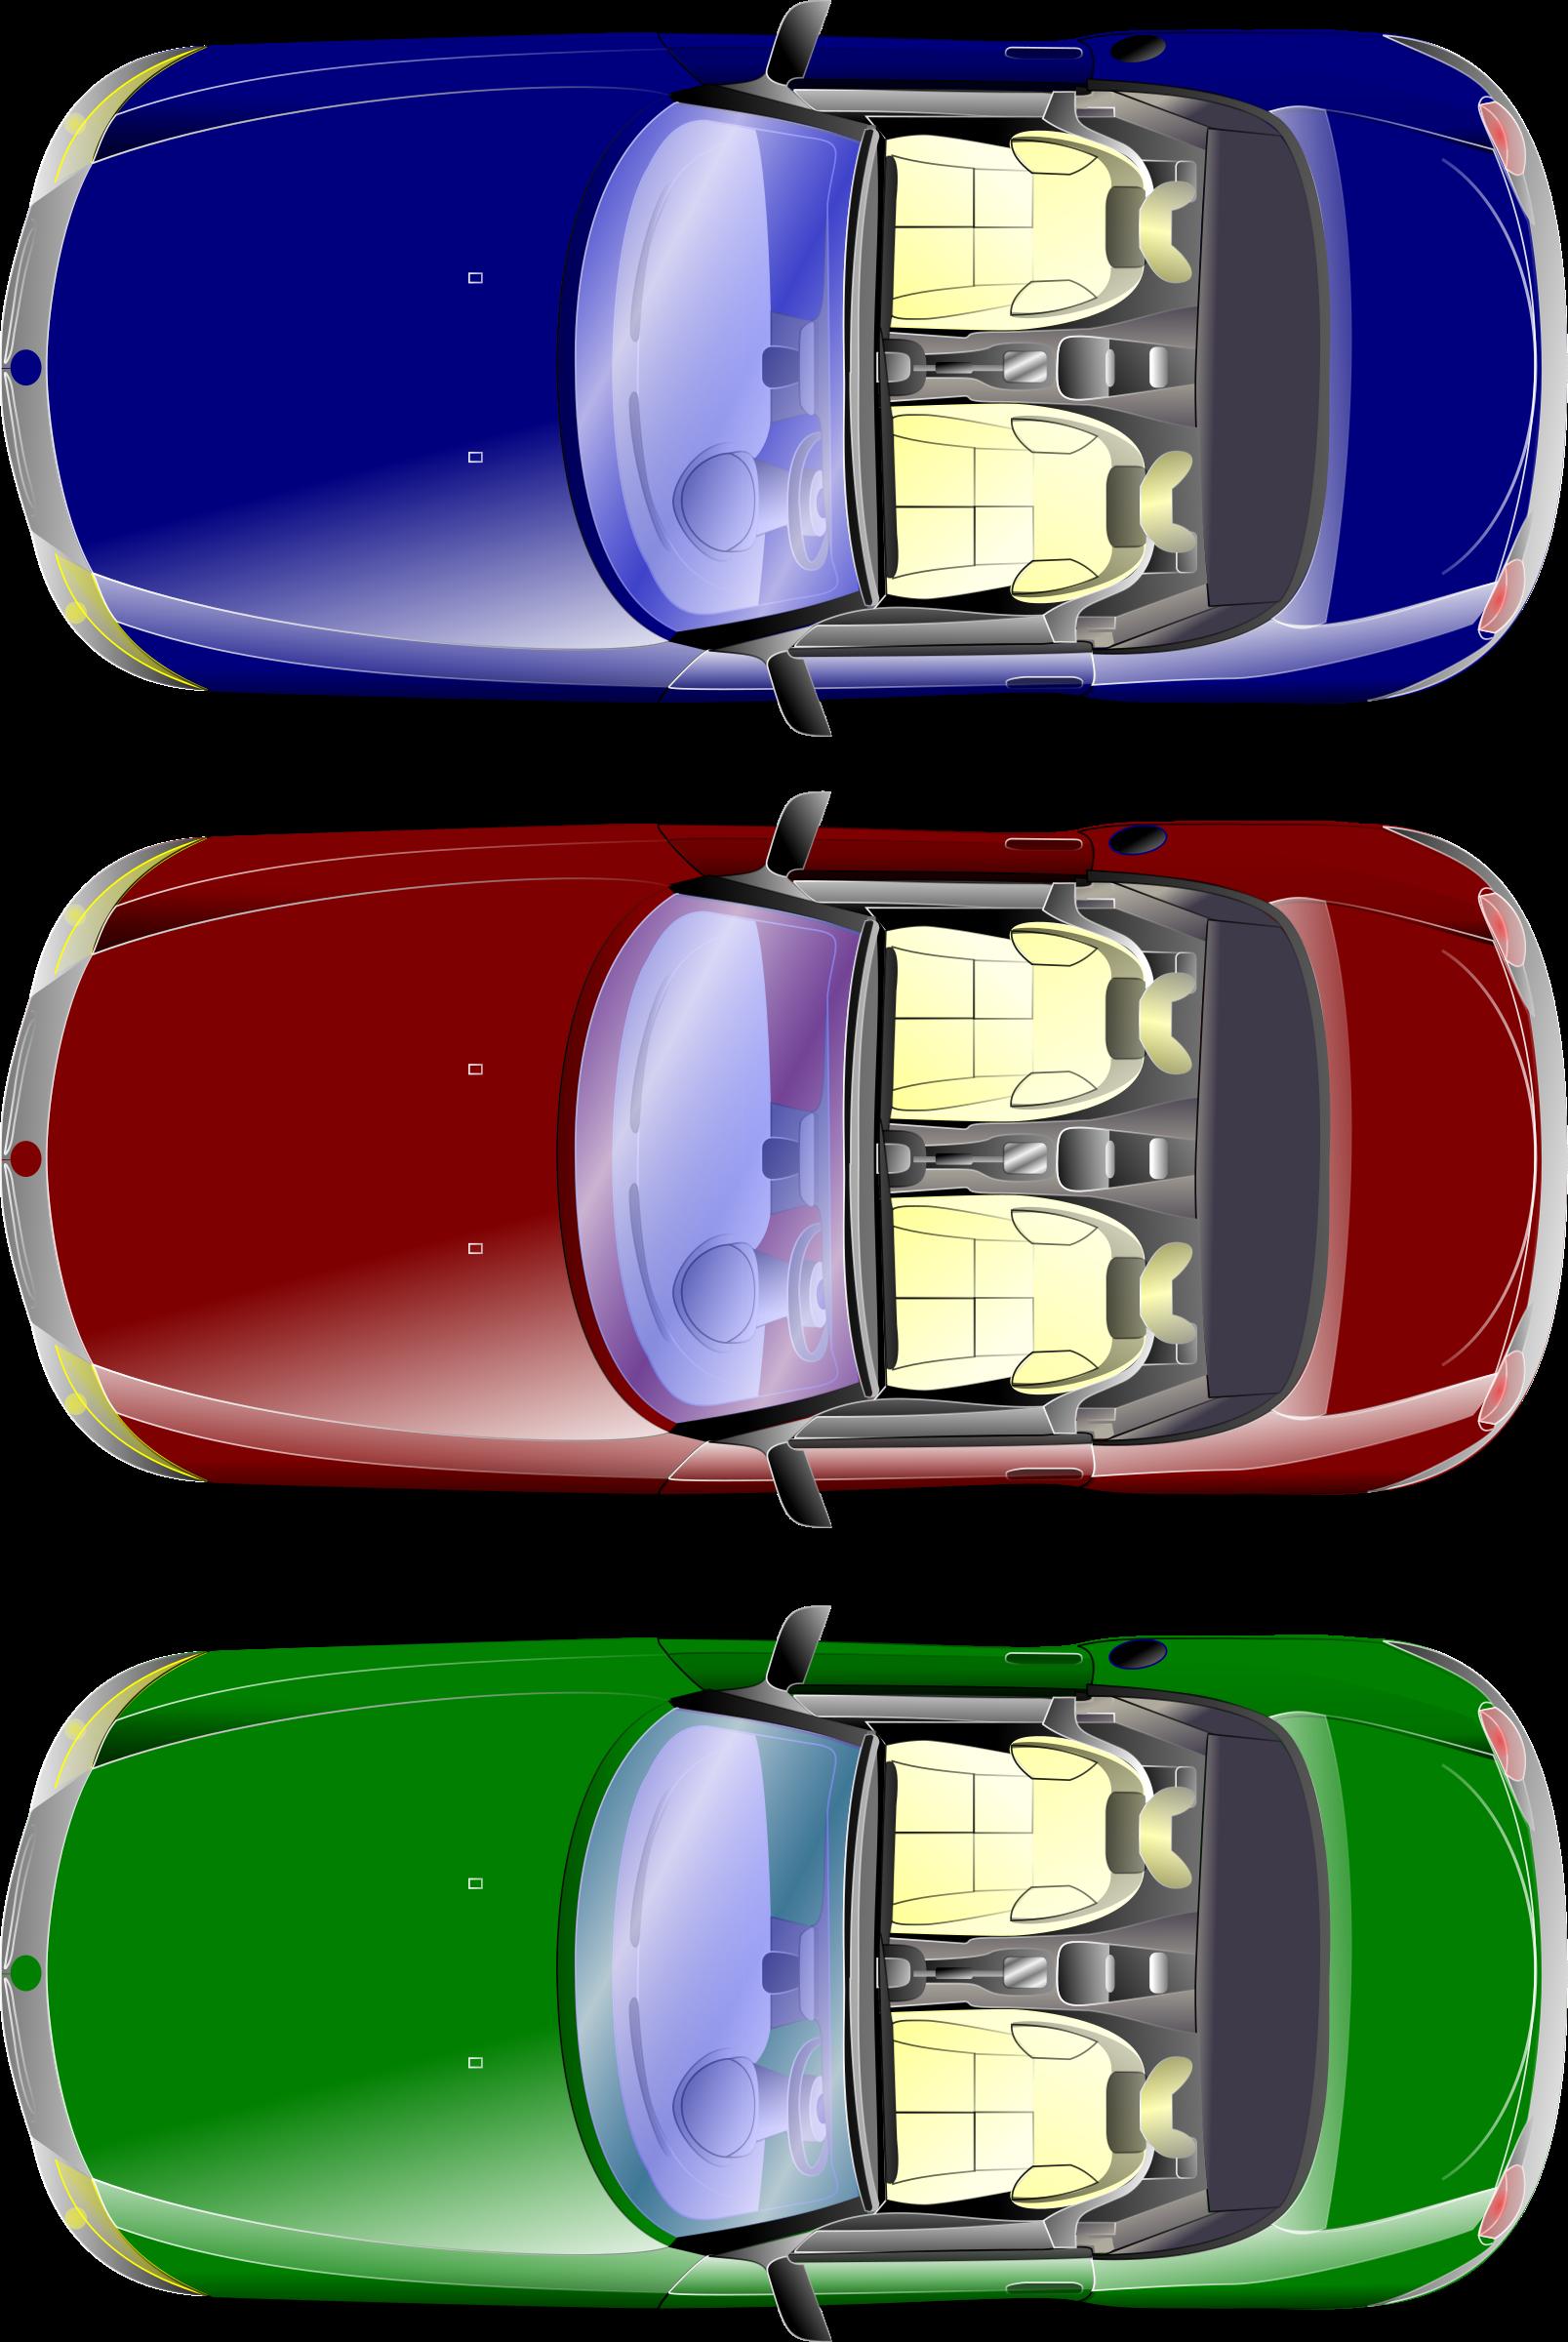 Clipart door top view. Car big image png